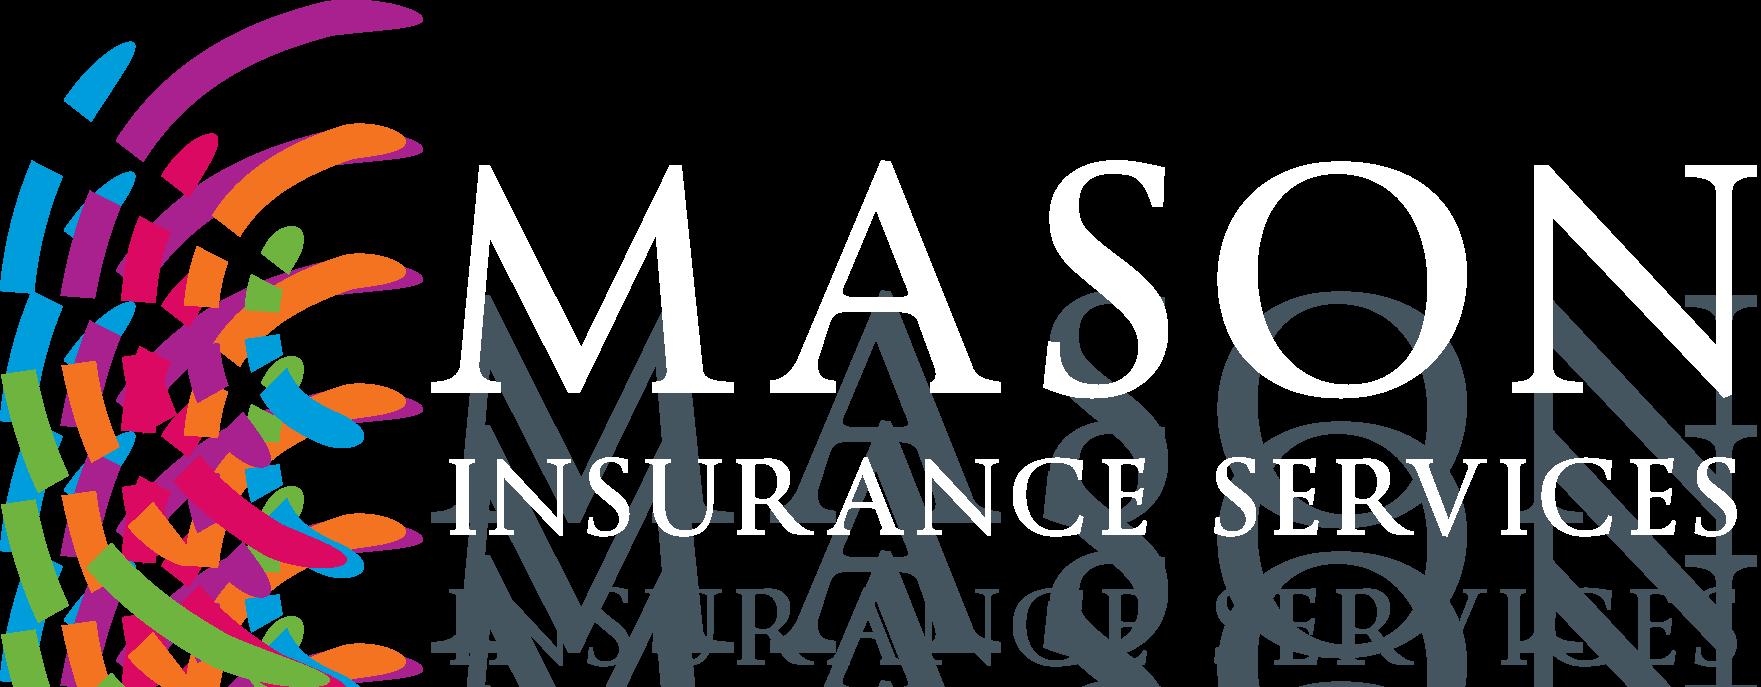 Mason Insurance Services